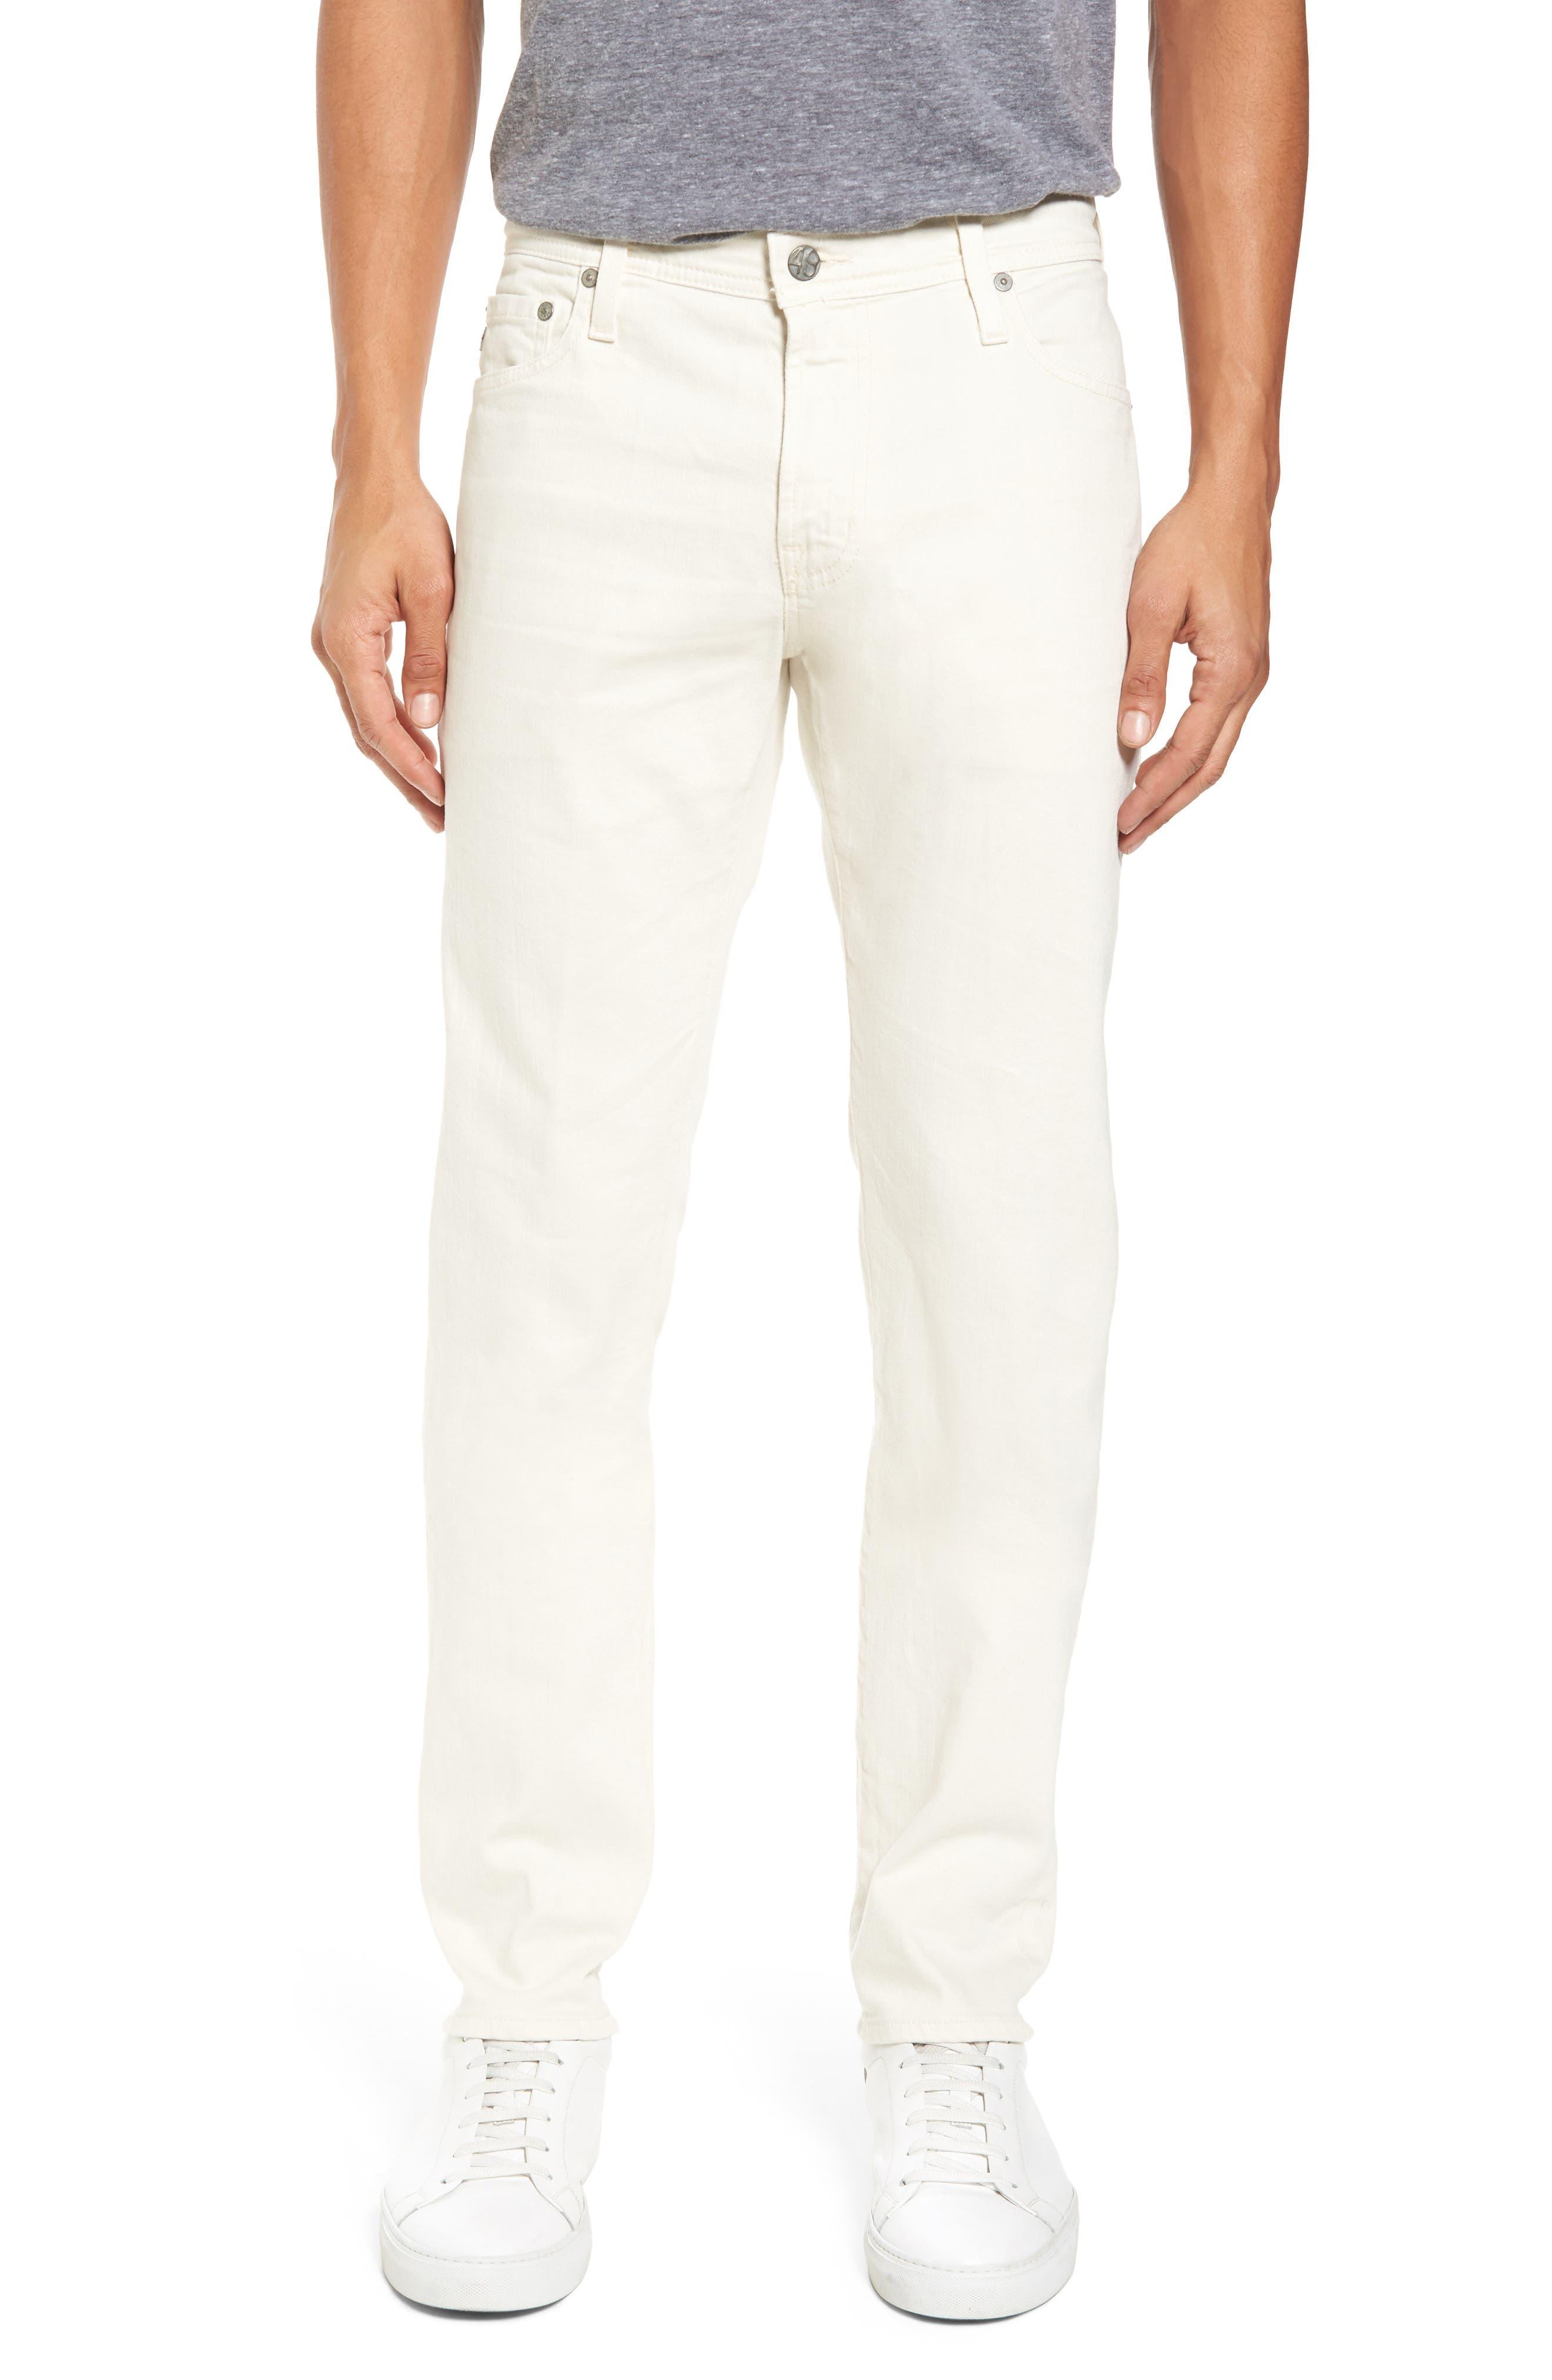 Tellis Modern Slim Twill Pants,                         Main,                         color, 020